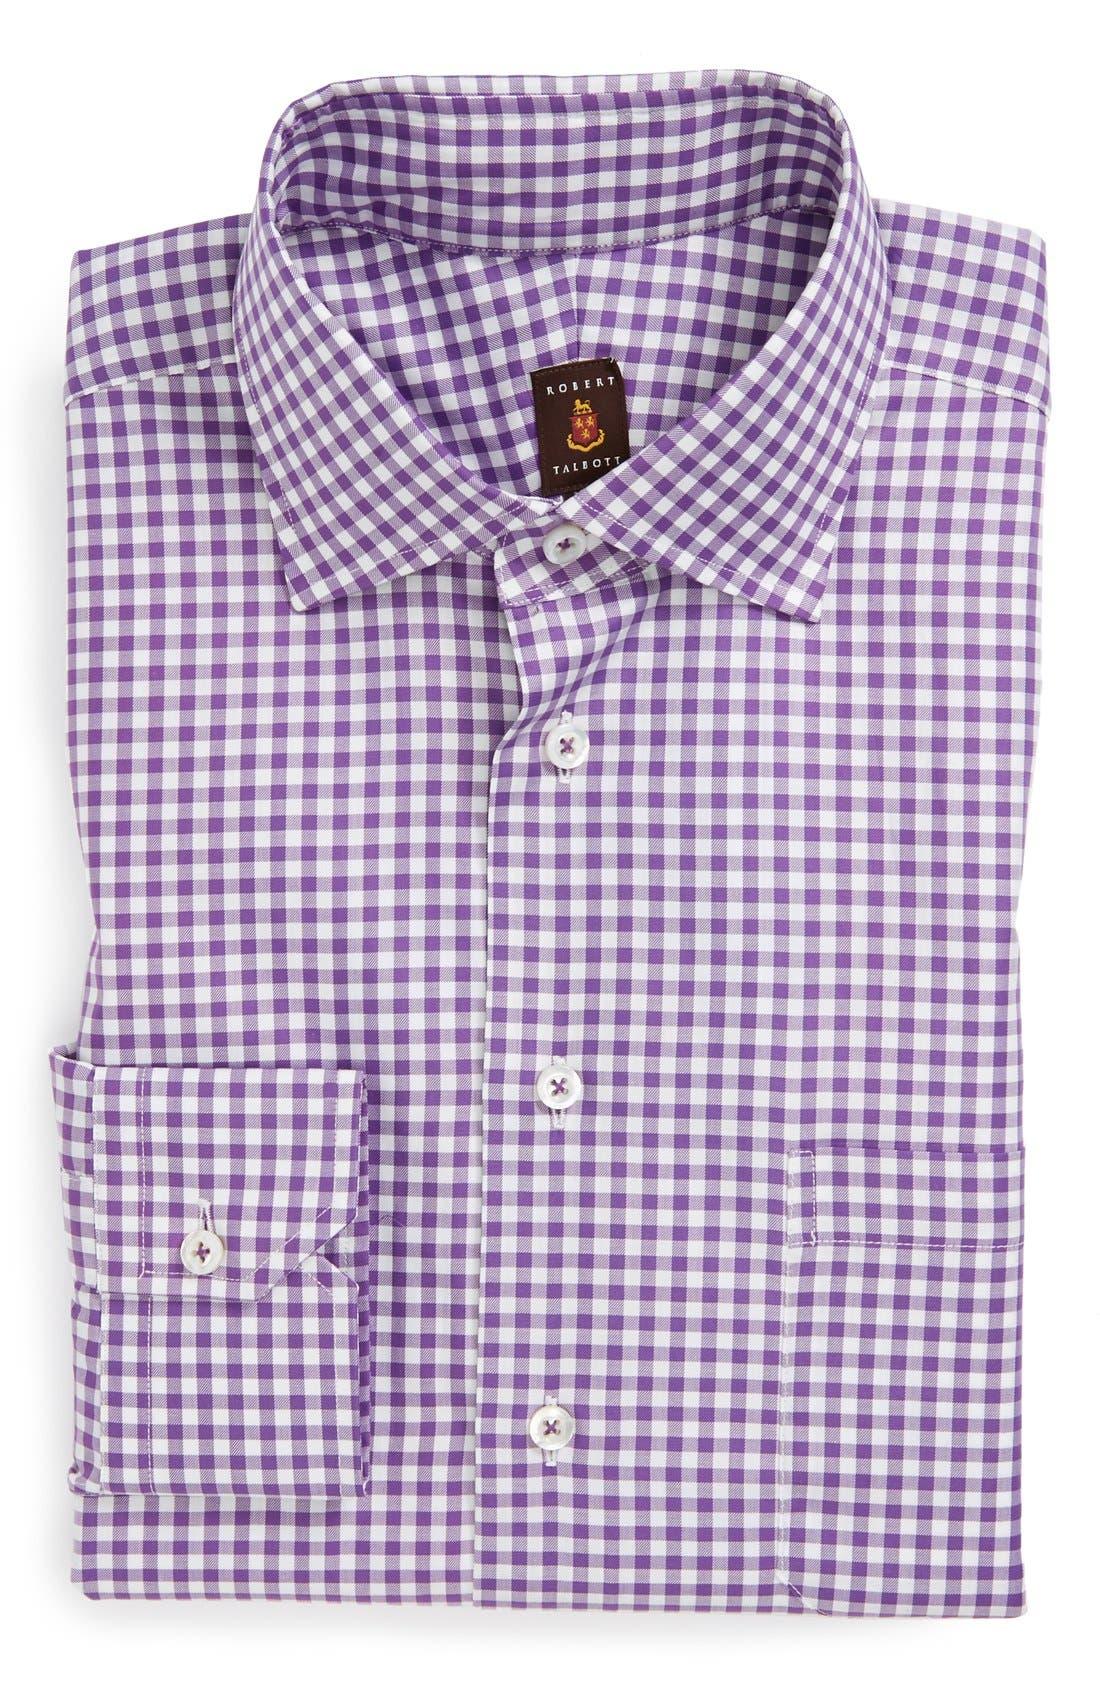 Main Image - Robert Talbott Twill Check Classic Fit Dress shirt